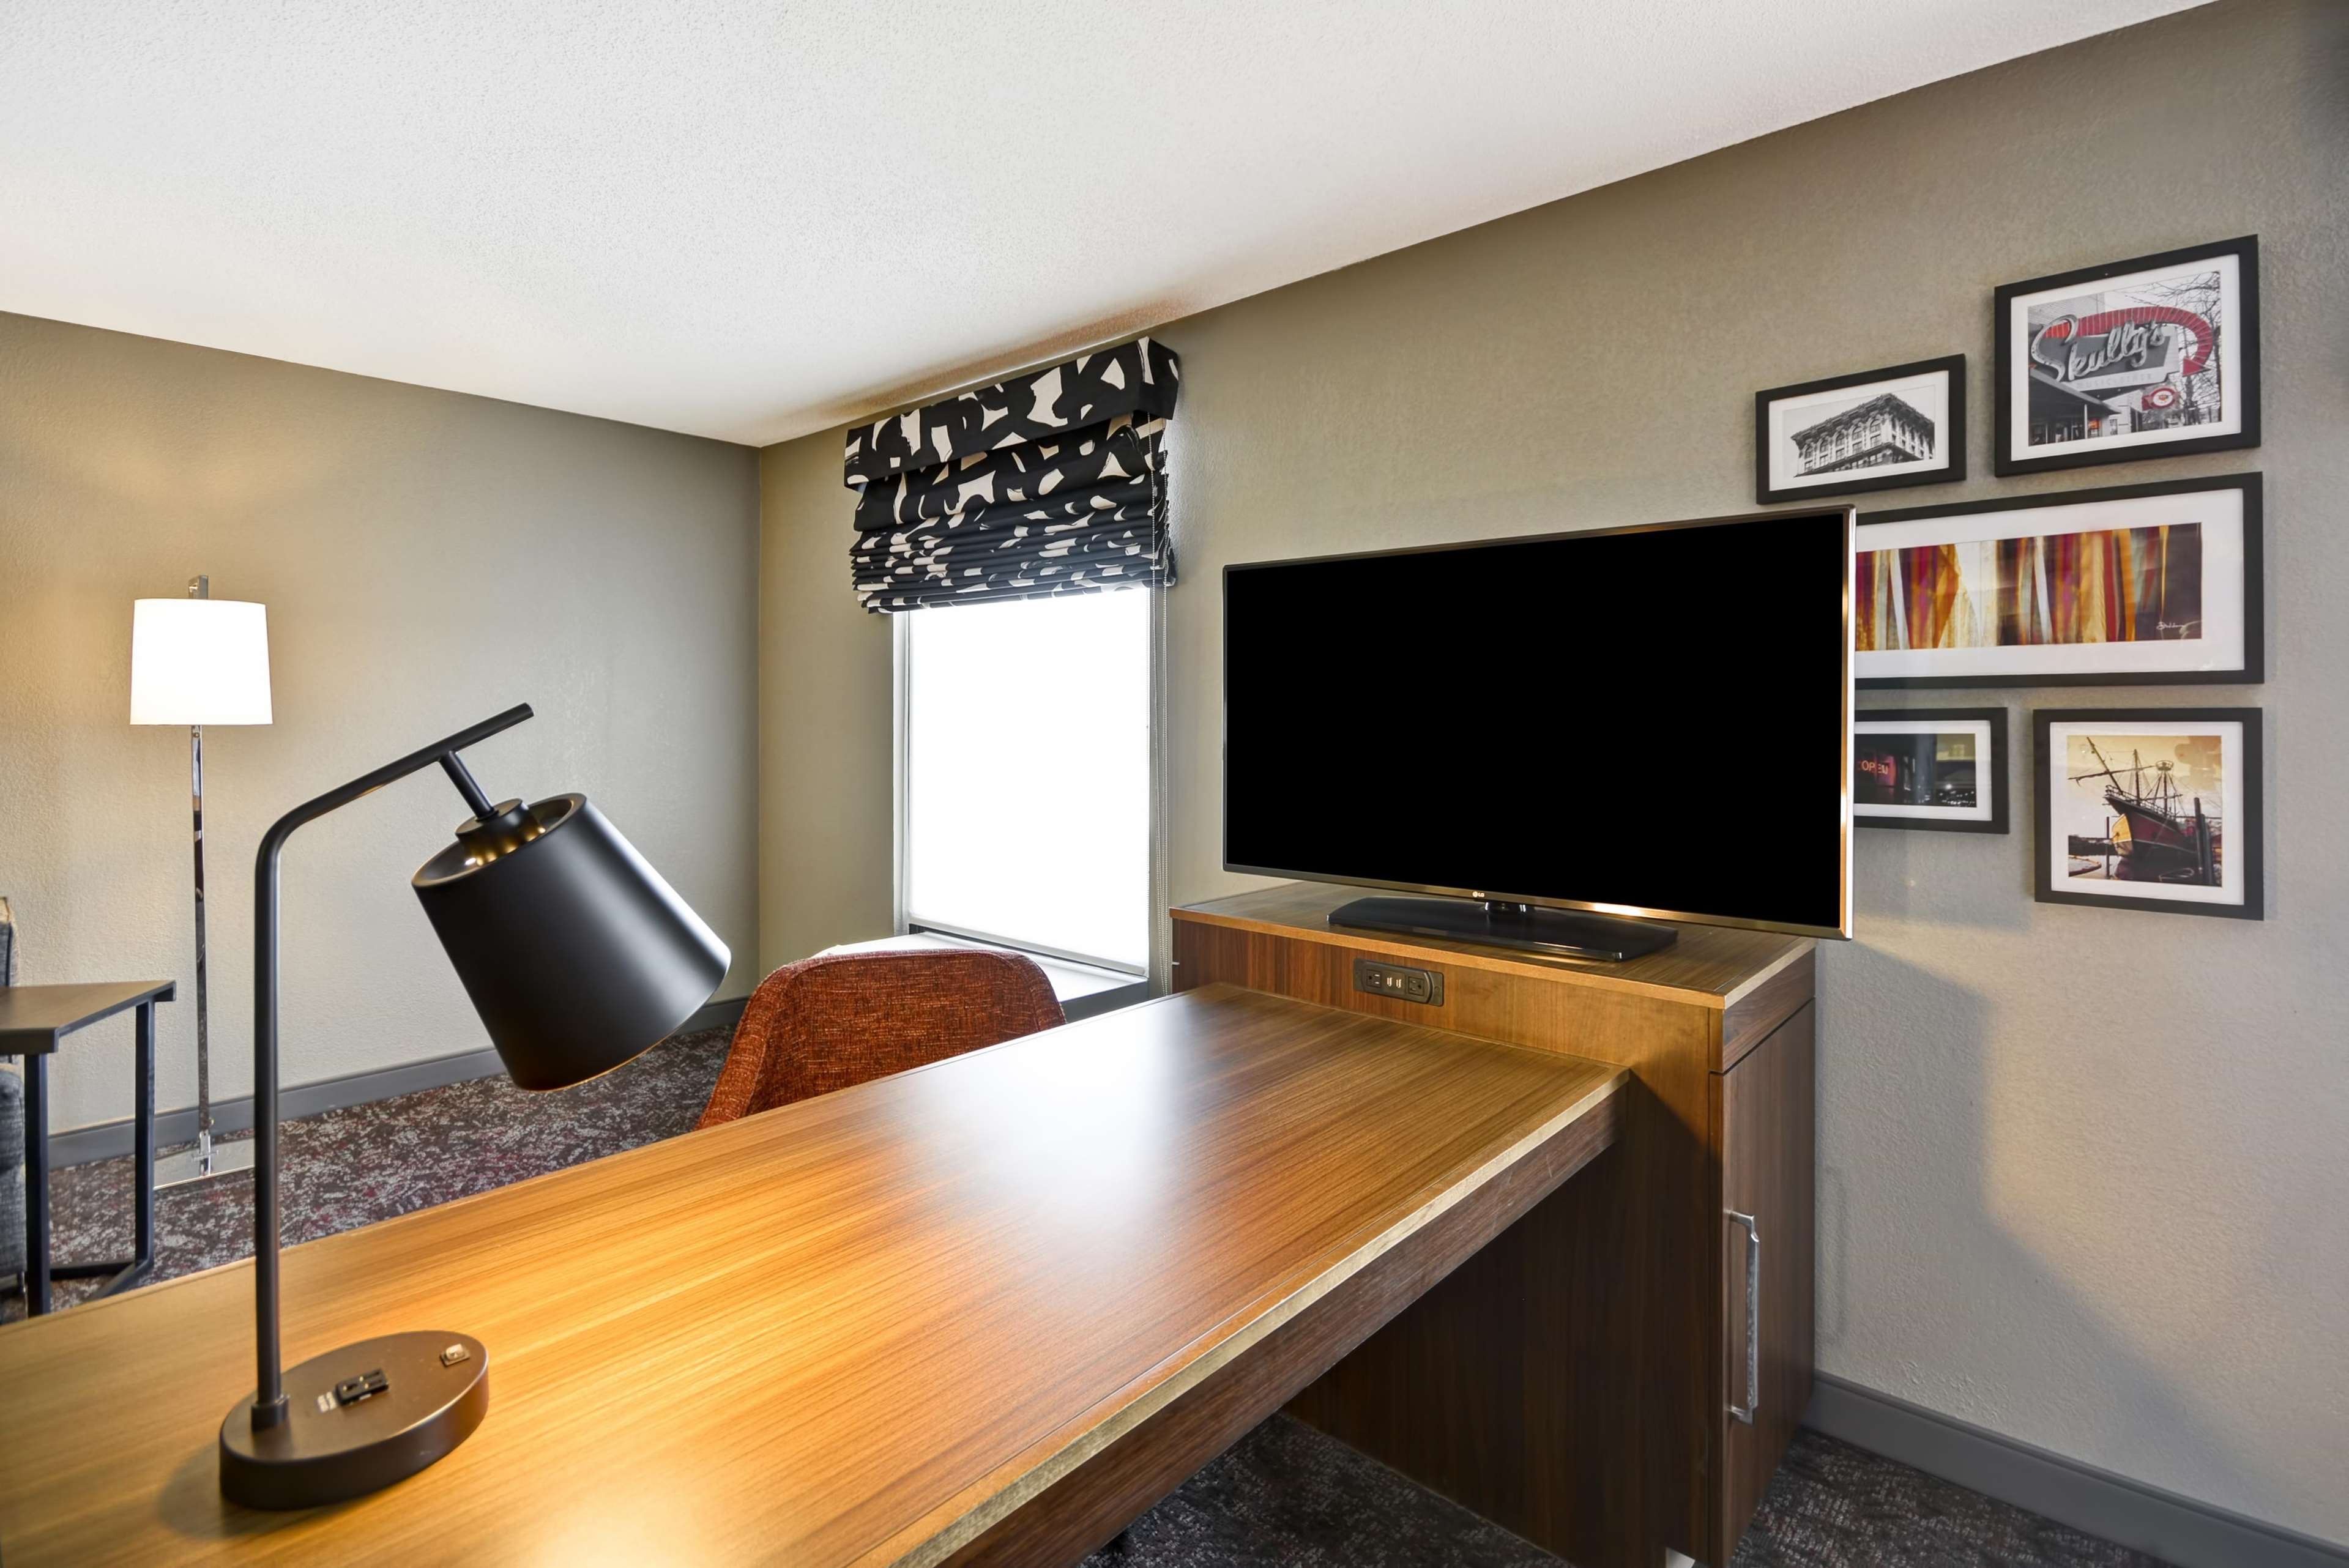 Hampton Inn & Suites Columbus-Easton Area image 37